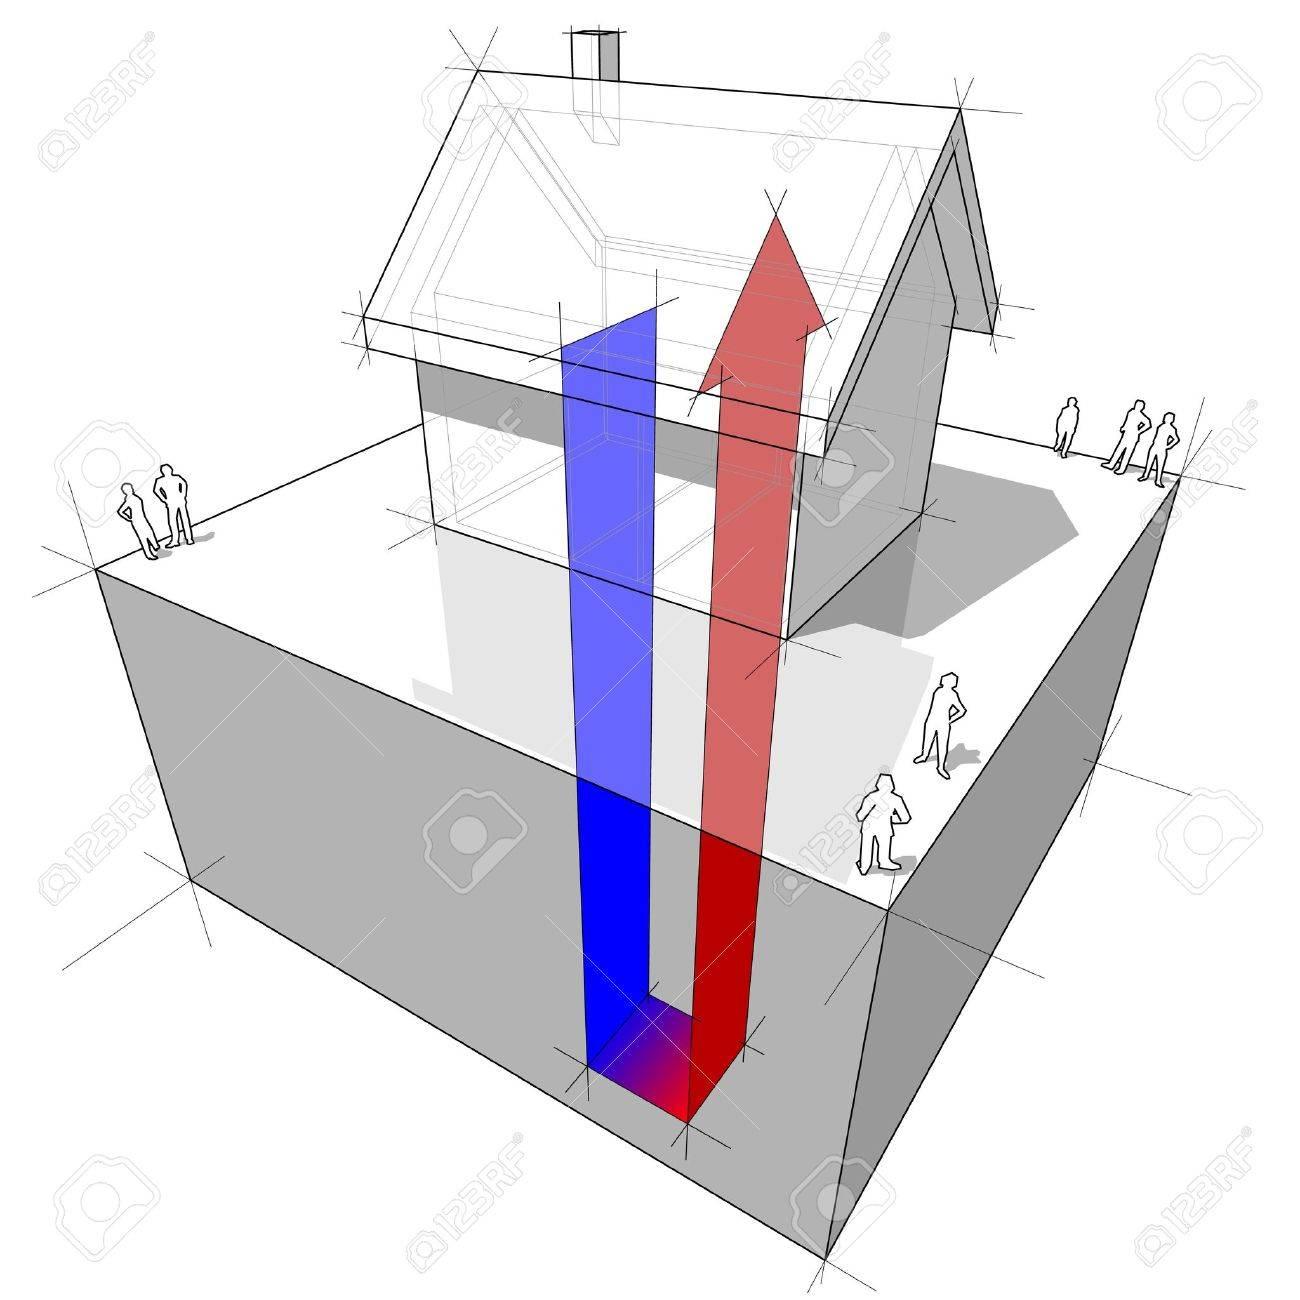 hight resolution of geothermal heat pump diagram stock vector 9930070